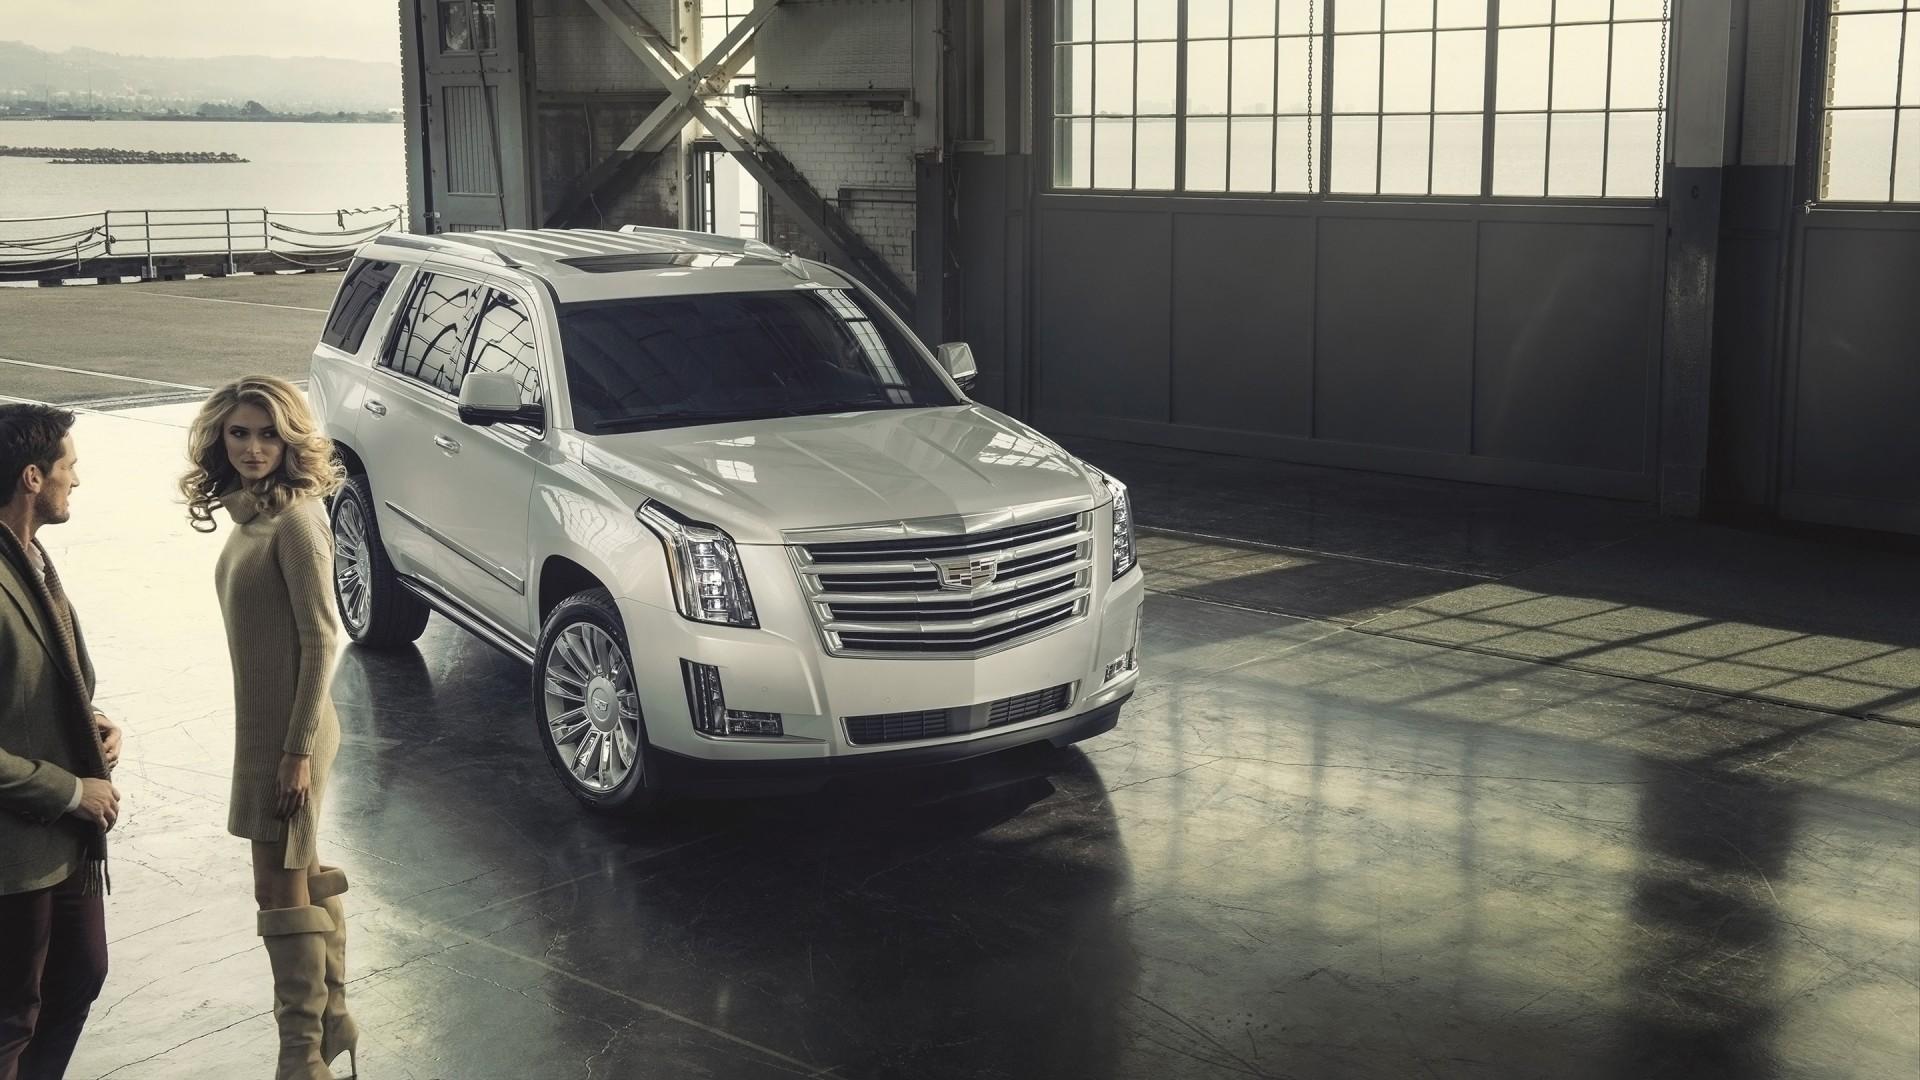 2018 Cadillac Escalade Wallpaper | HD Car Wallpapers | ID ...